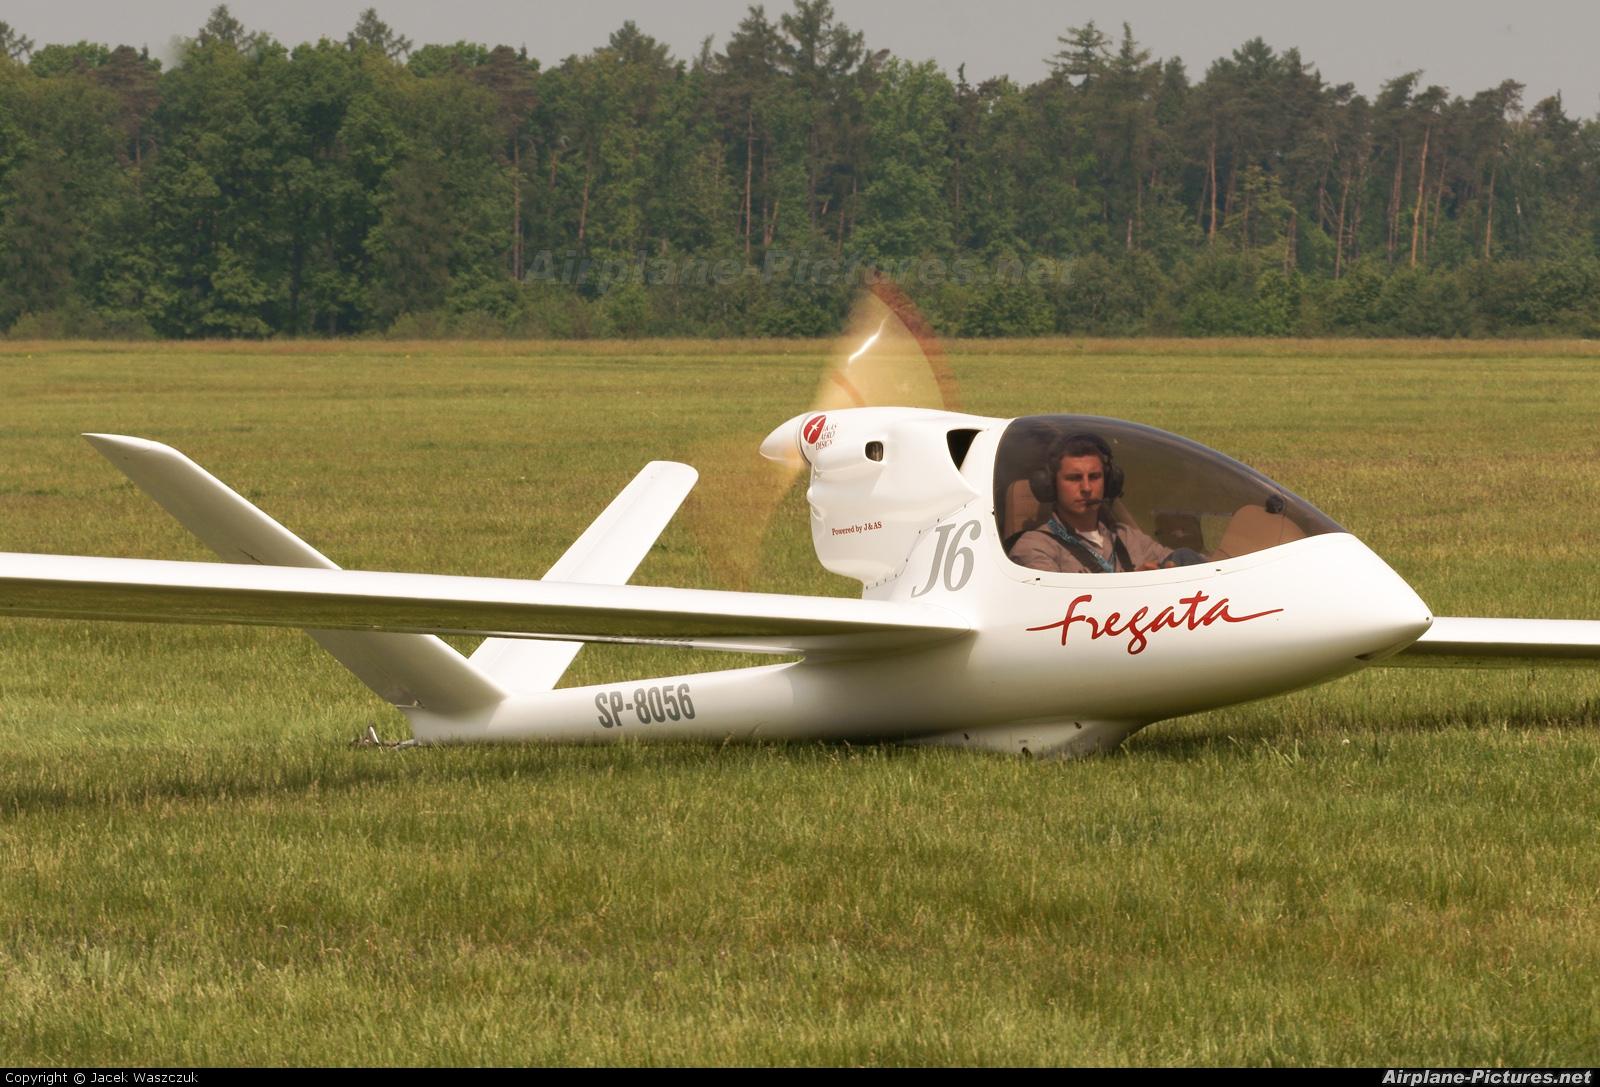 El juego de las imagenes-http://cdn.airplane-pictures.net/images/uploaded-images/2011/7/6/144904.jpg